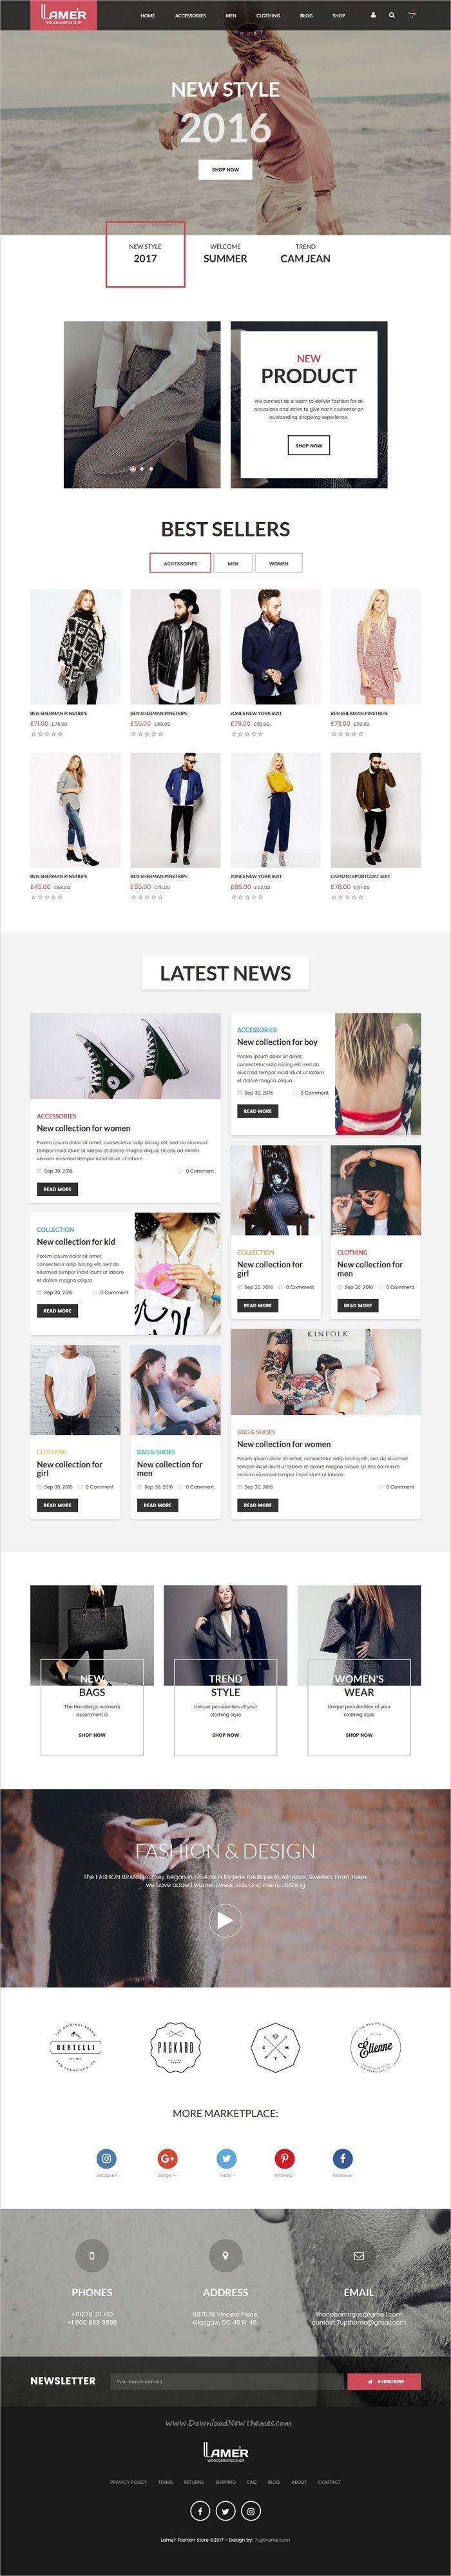 9 best WordPress Theme images on Pinterest